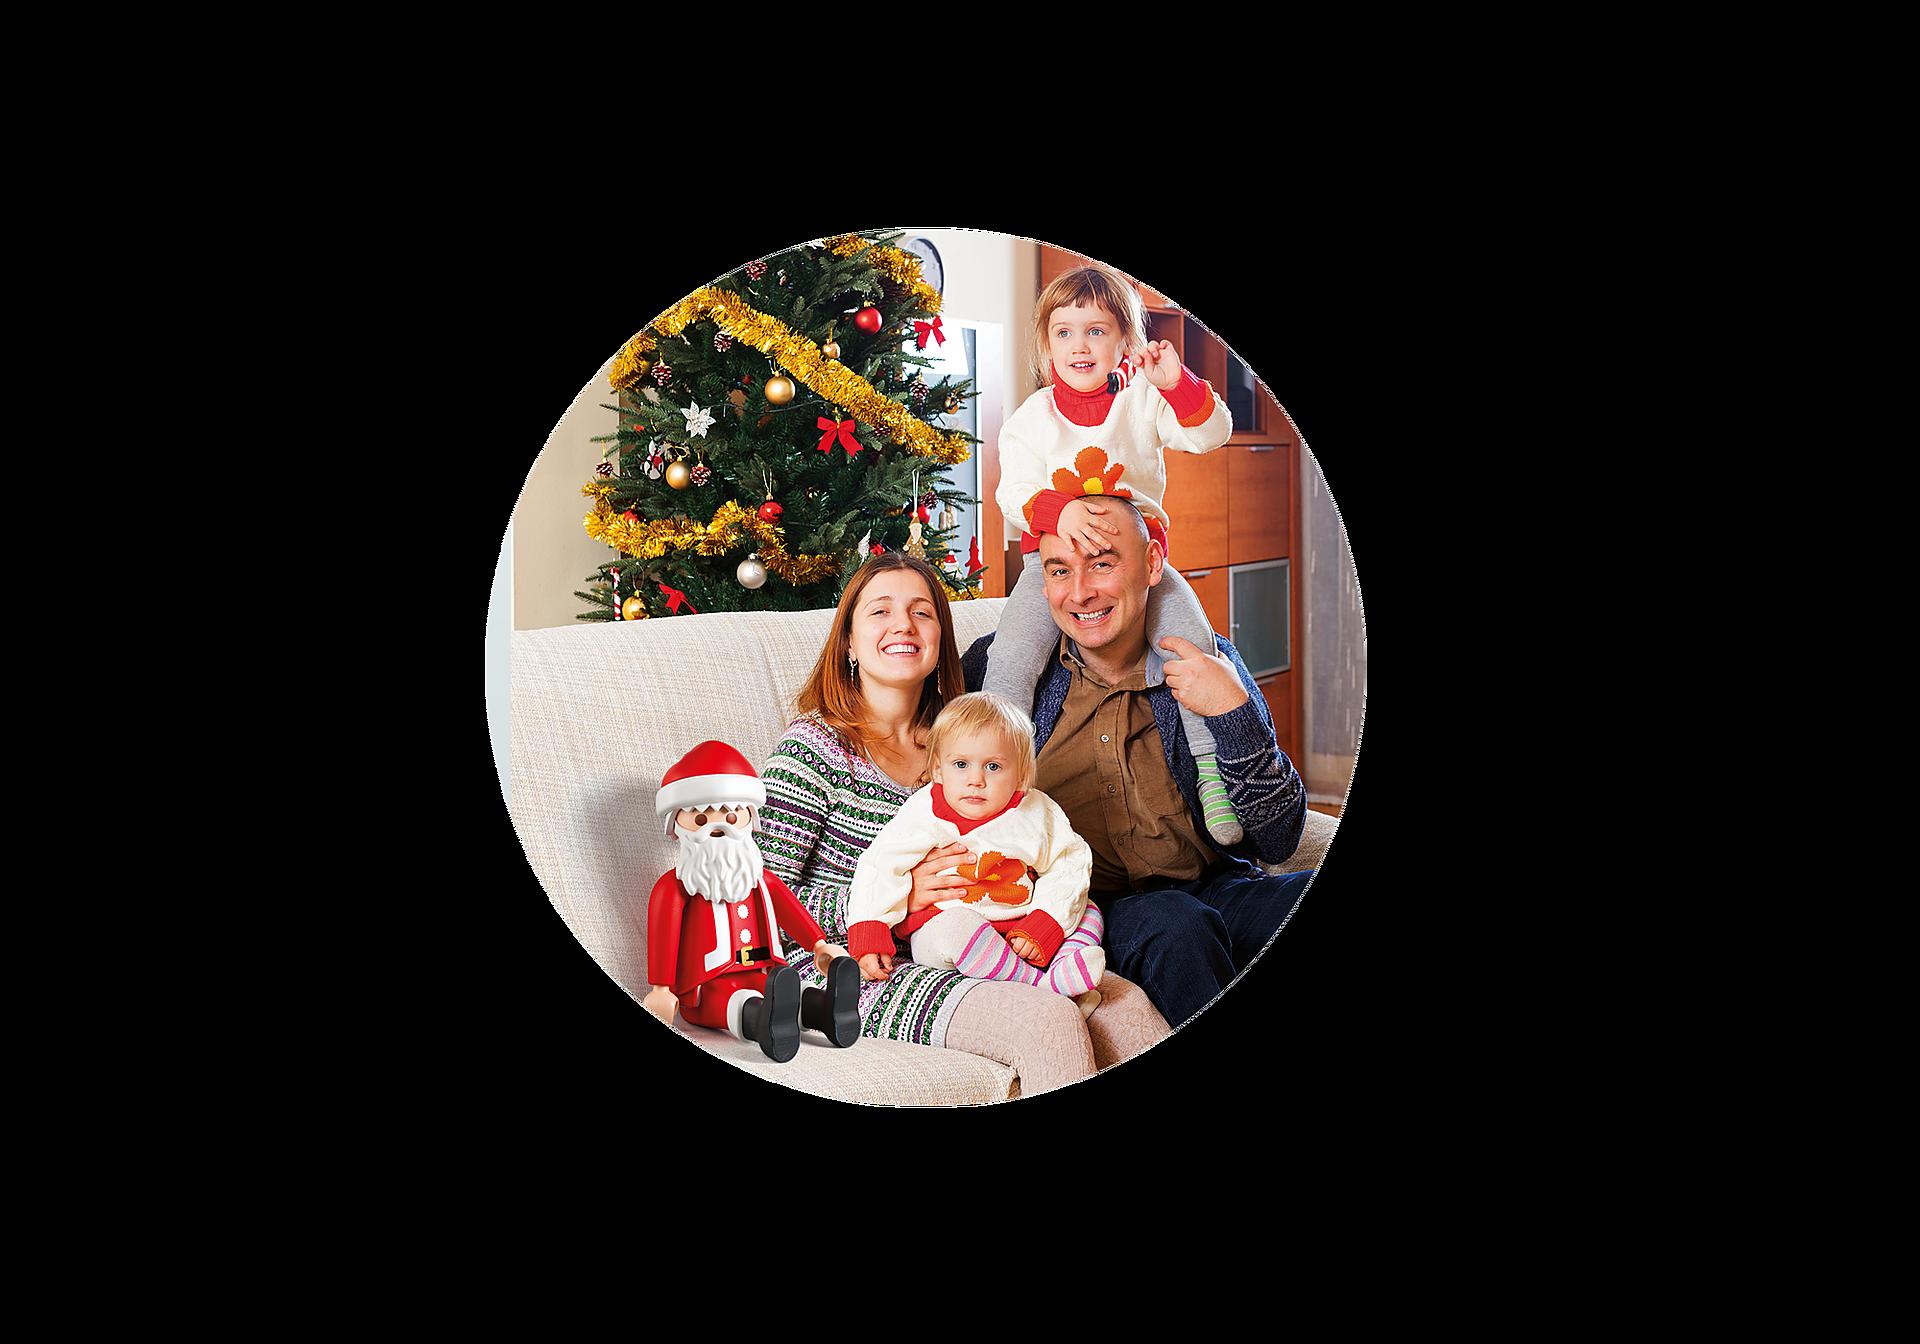 6629 PLAYMOBIL XXL-Weihnachtsmann zoom image4